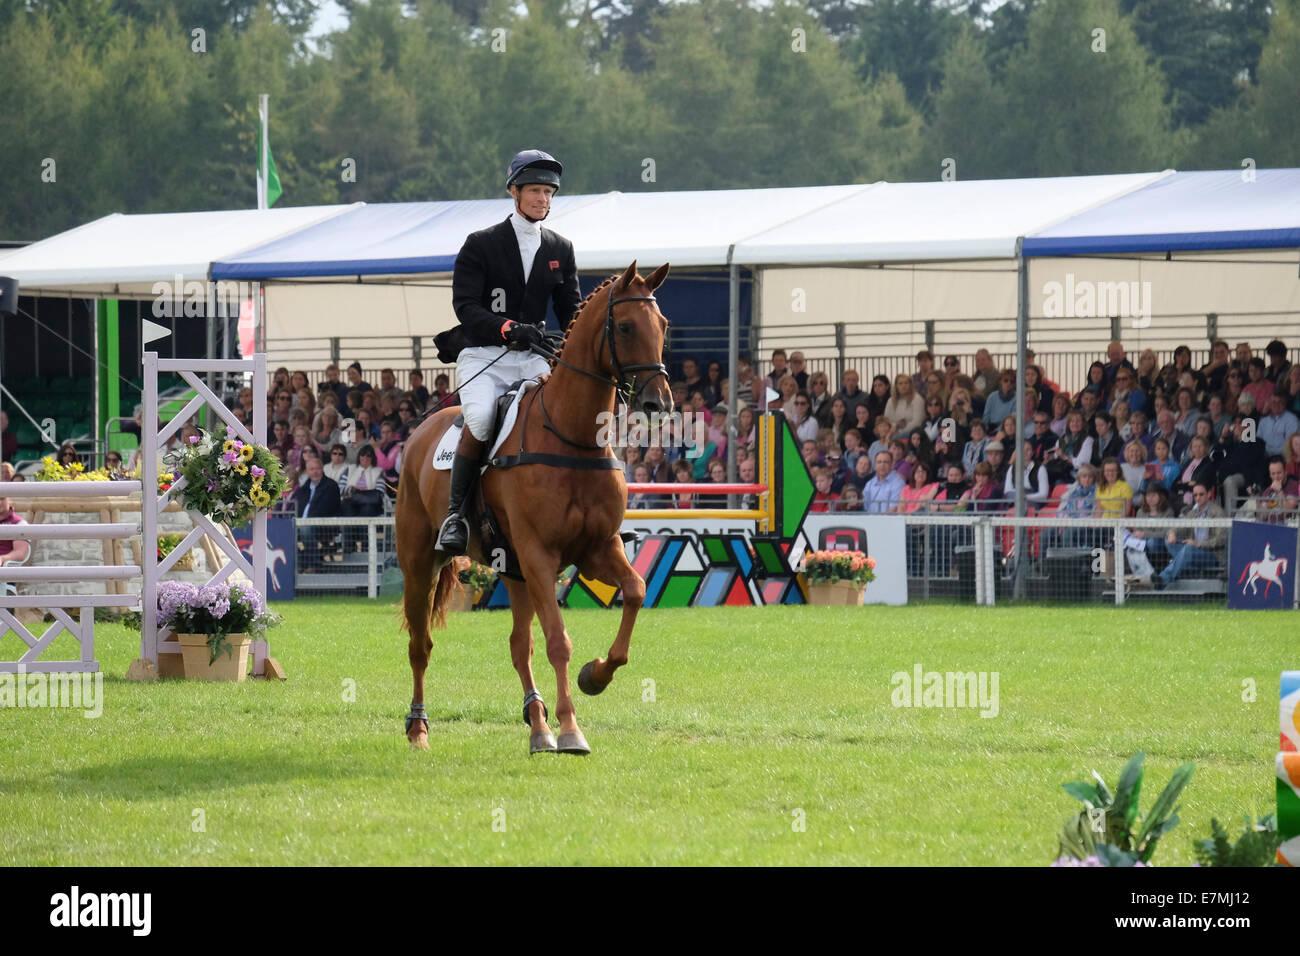 William Fox Pitt, Eventing, Blenheim, Palace 2014 - Stock Image